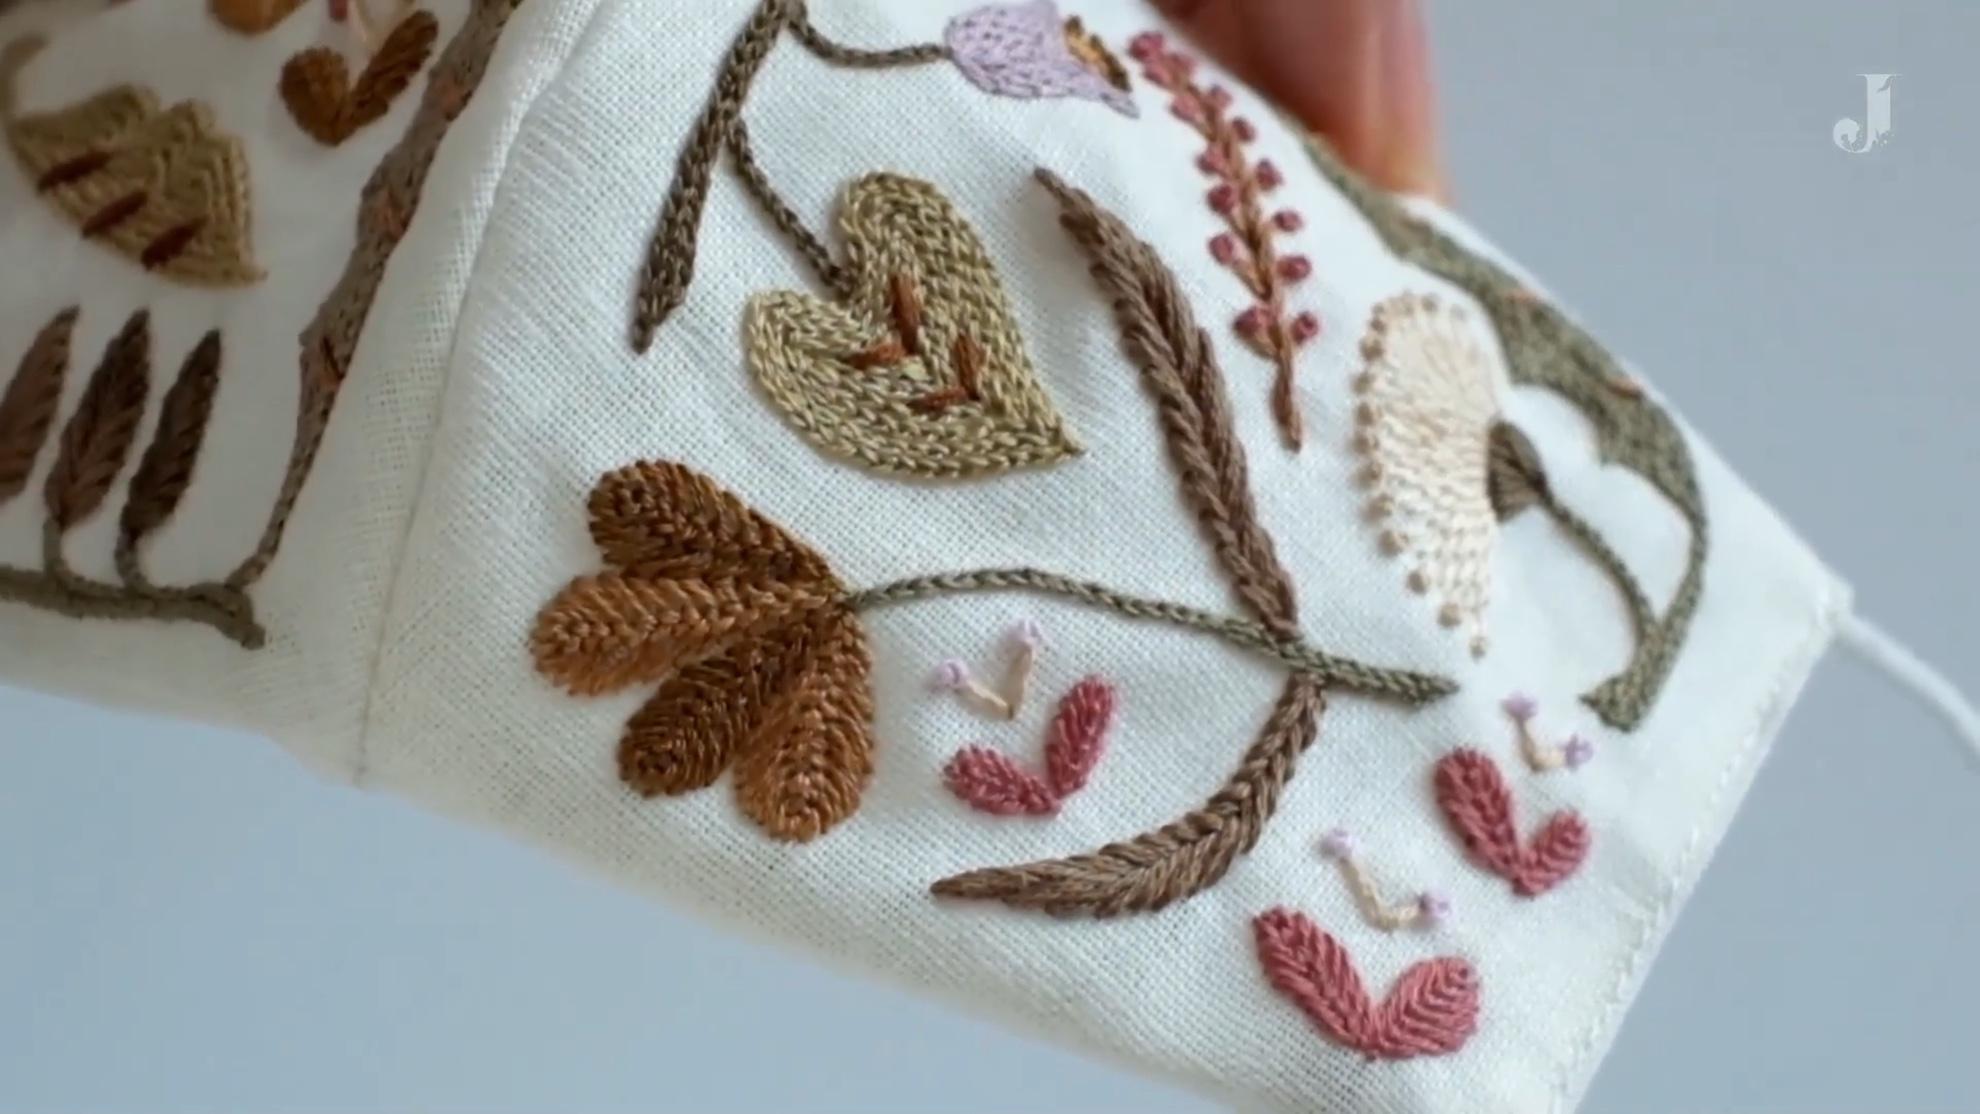 DIY手工法国绣视频教程:克里特绣(Cretan stitch)与飞鸟绣(fly stitch)